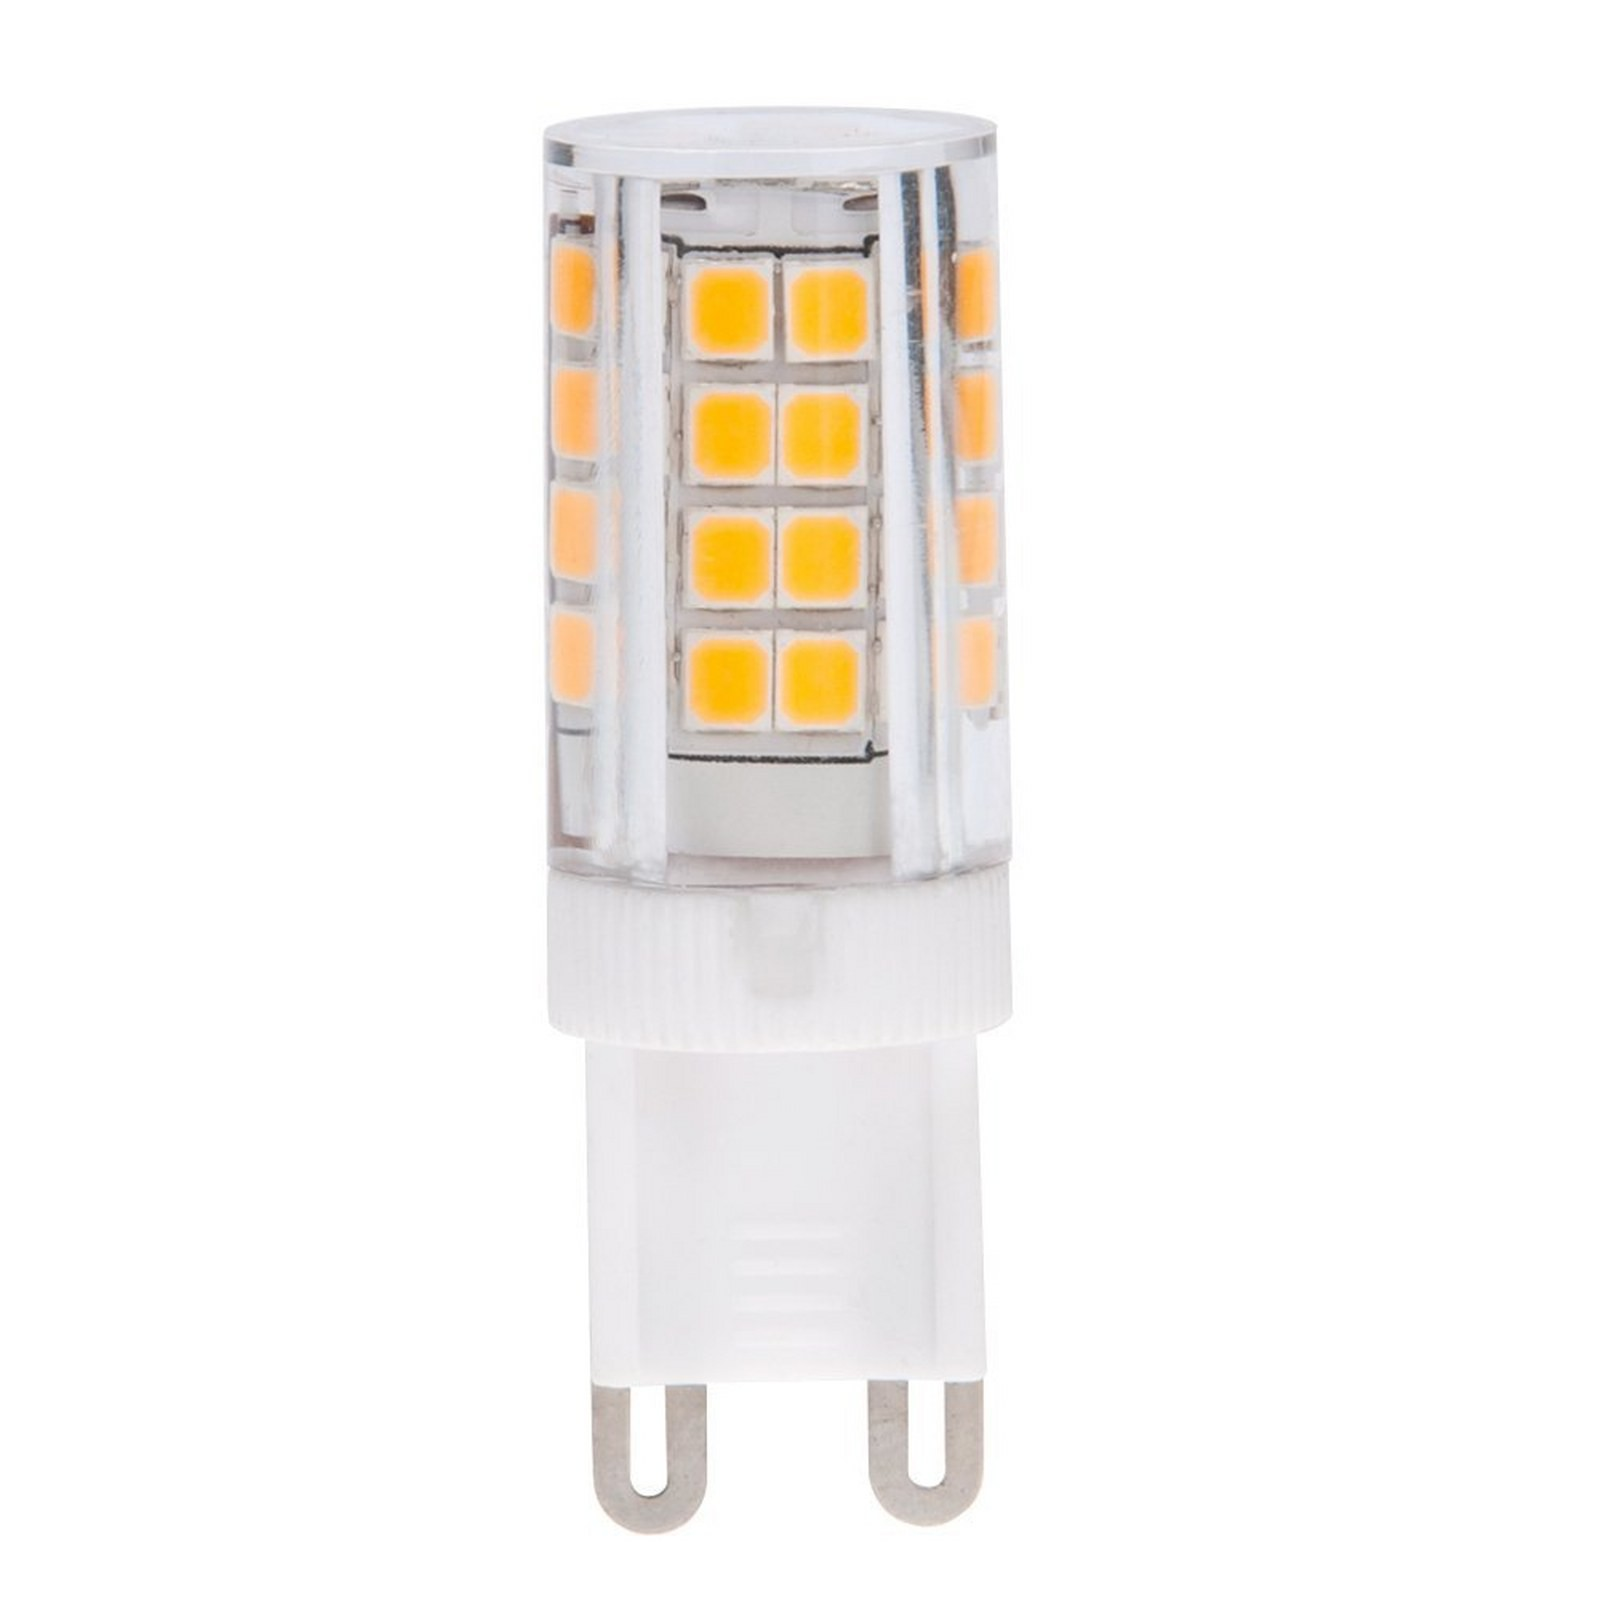 Lampada Led Lampadina Attacco G9 Luce Naturale SMD LIFE 4 Watt 350 Lumen - Area Illumina